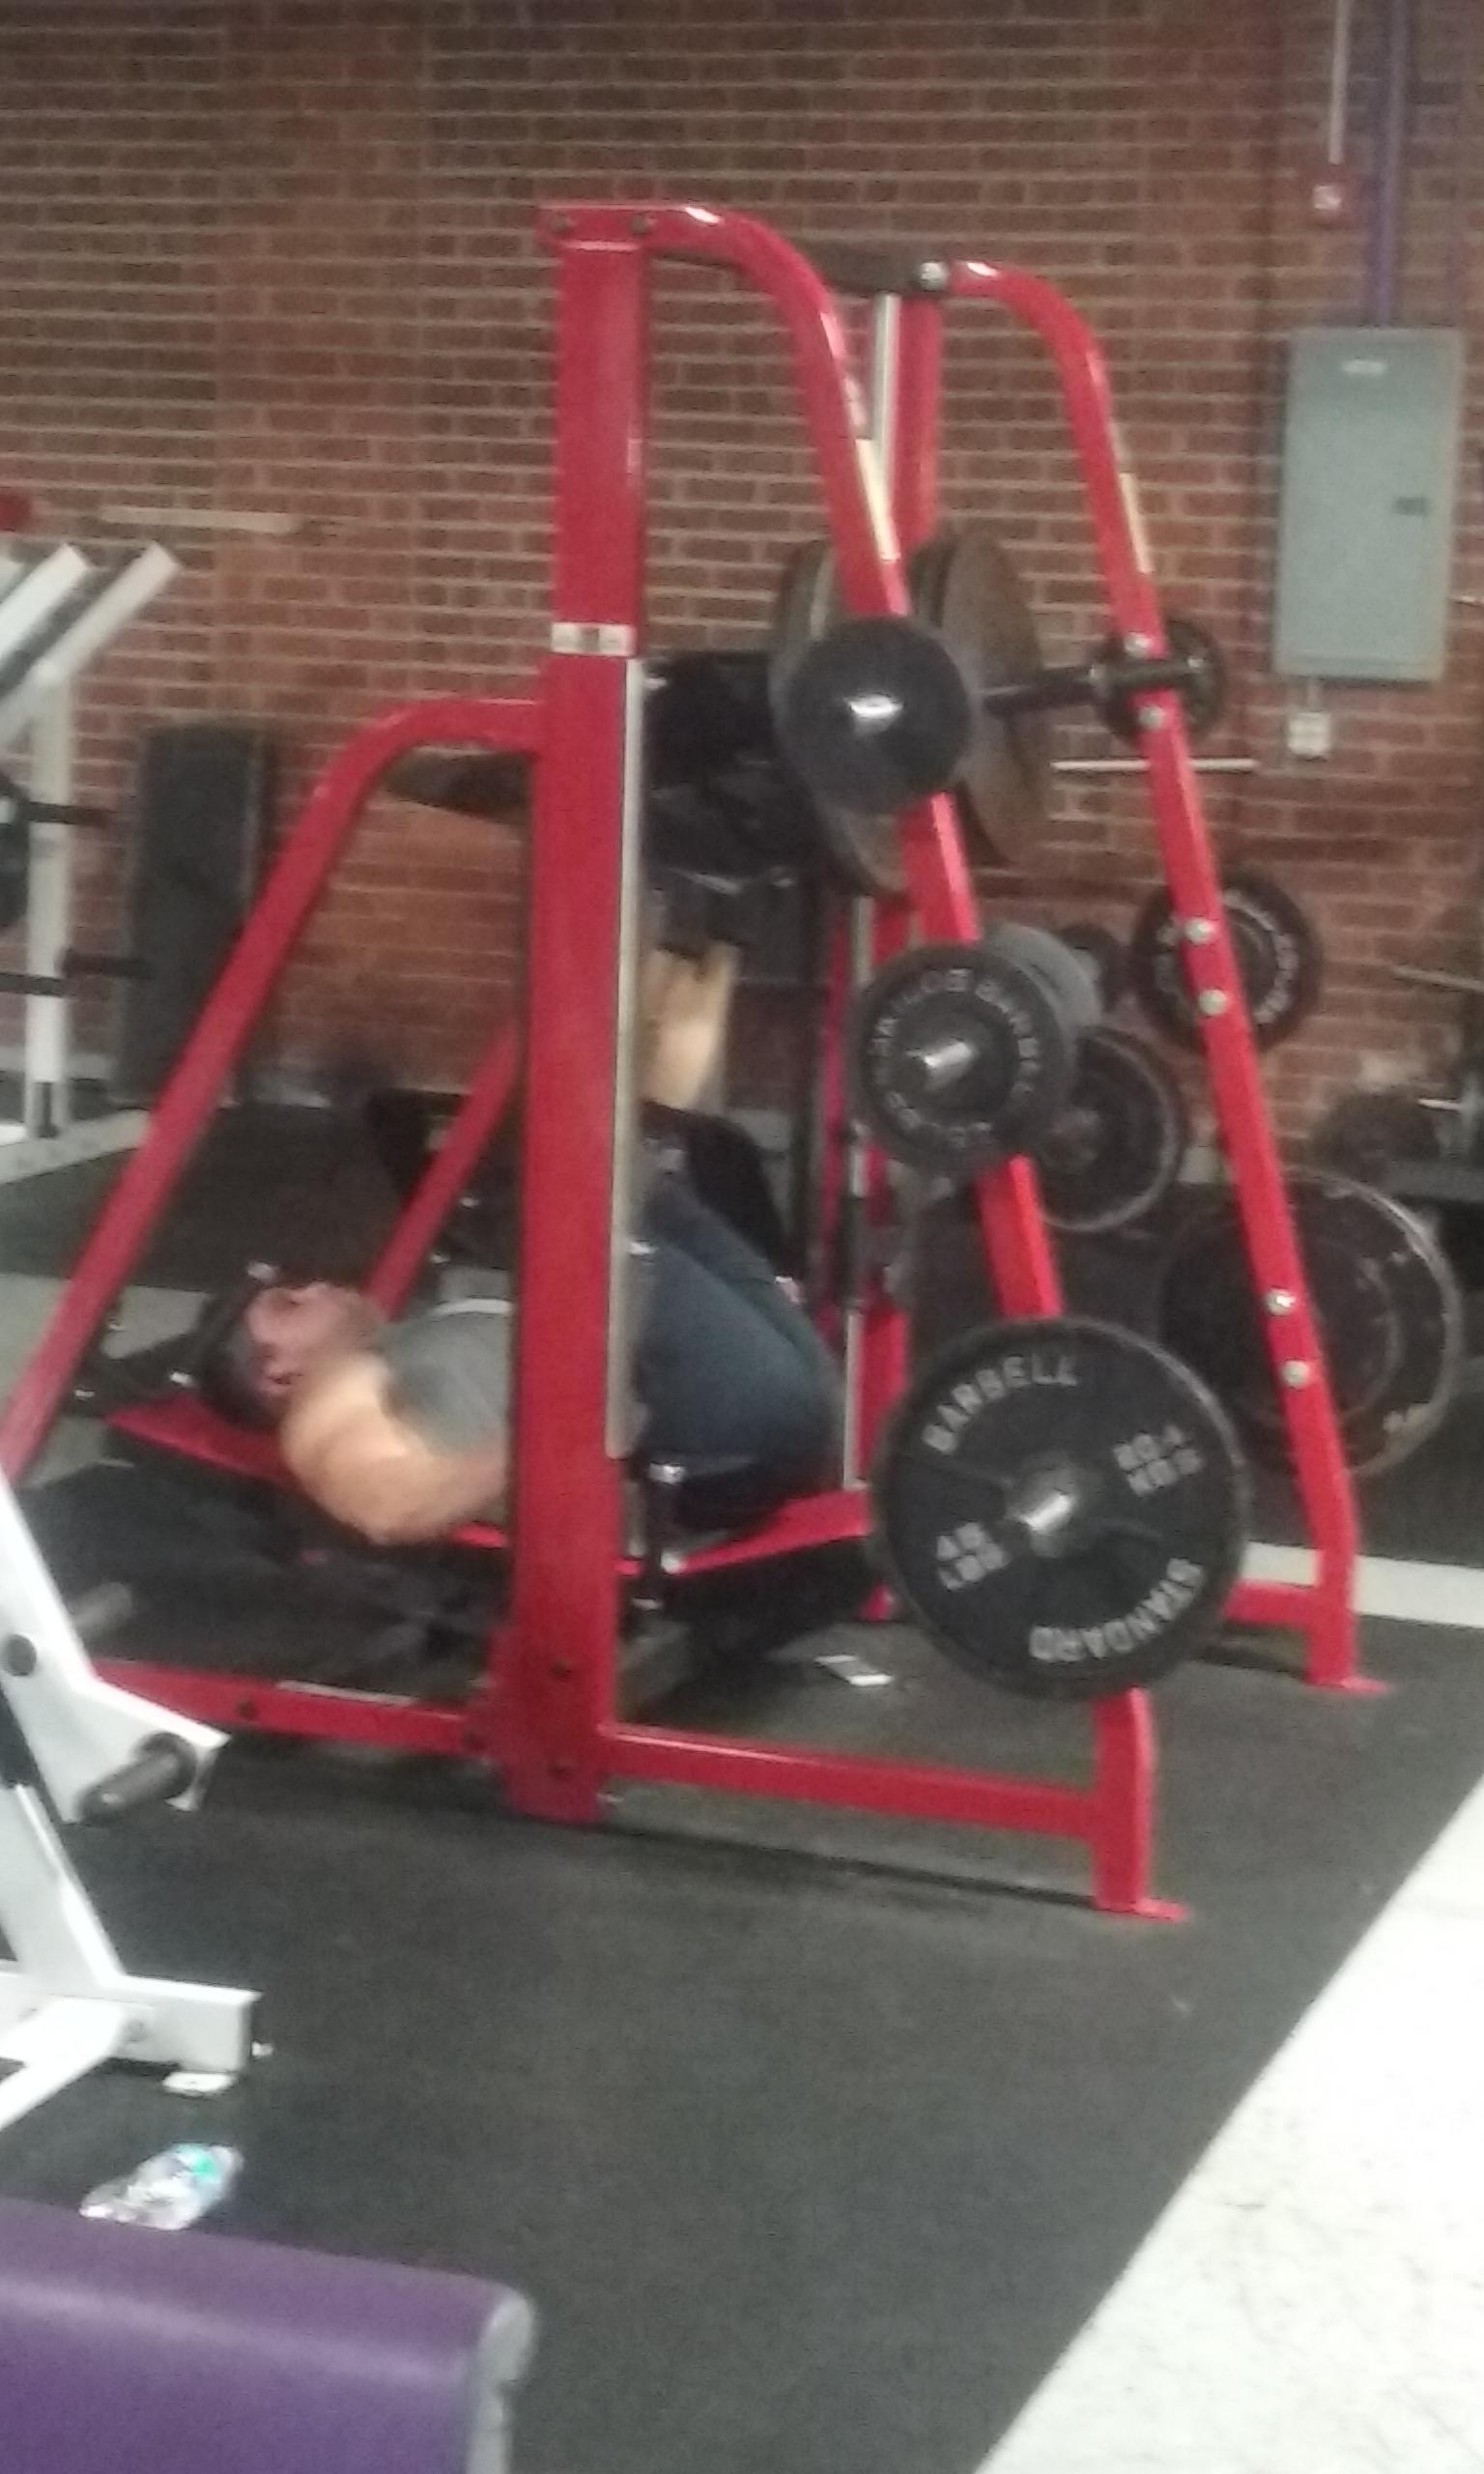 Everybodies Gym image 2